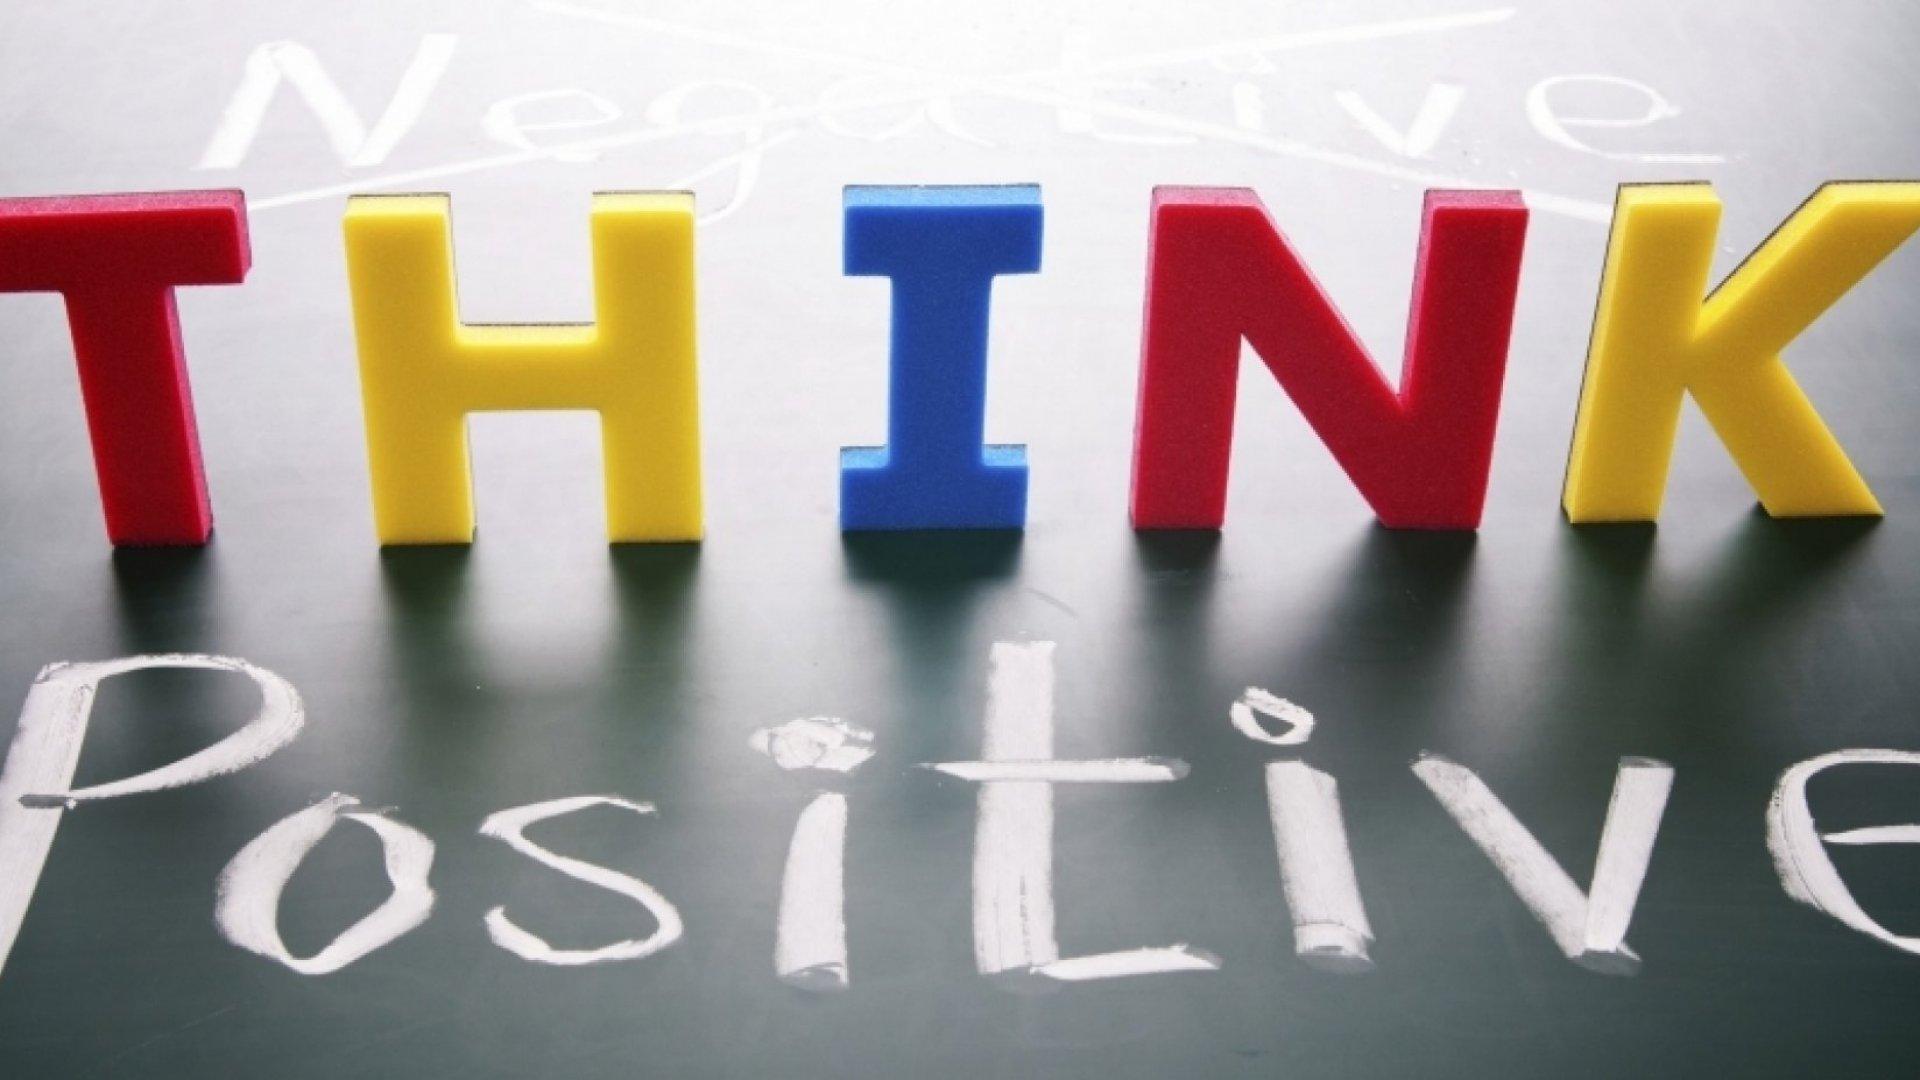 2 Ways to Turn Negativity Into Positivity